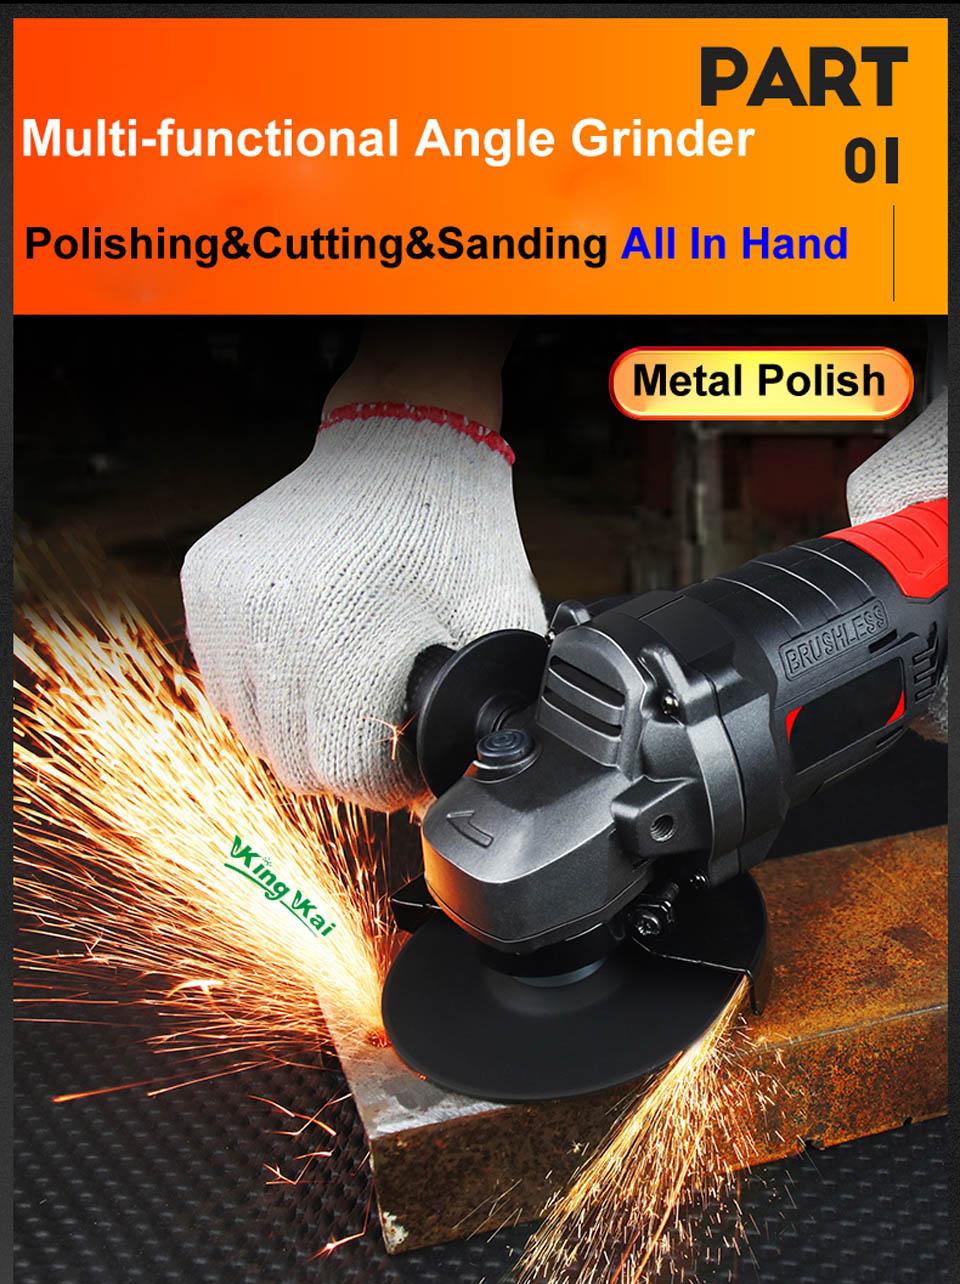 Brushless Cordless Battery Sand Polish Cut Angle Grinder-01 (4)